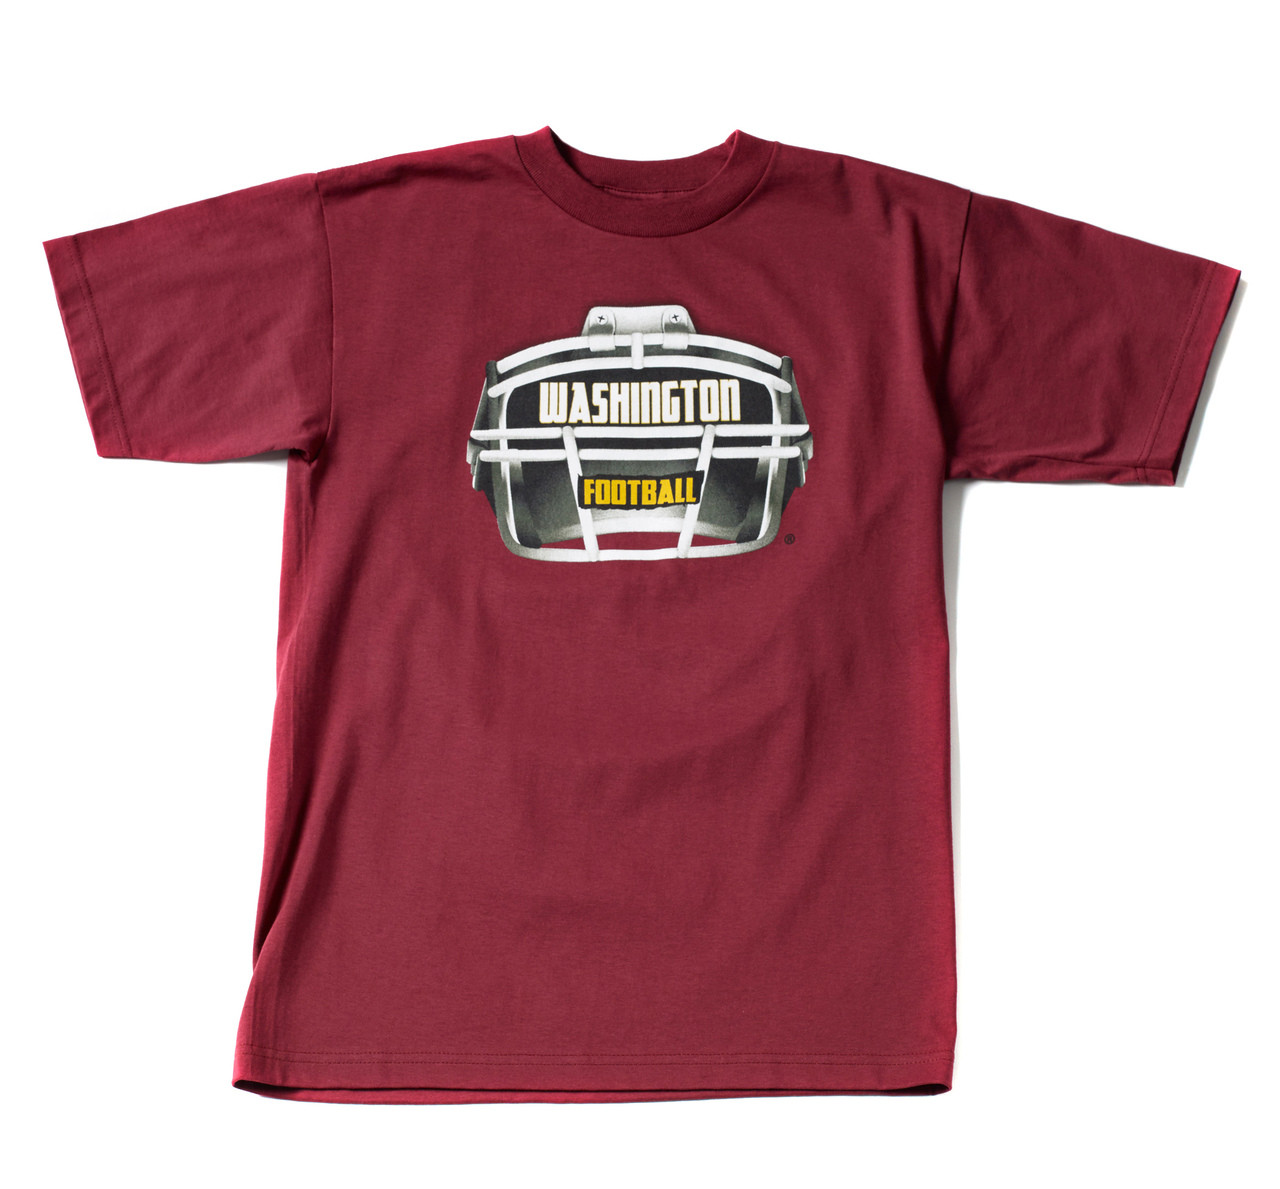 8512c122449 Washington Redskins T-shirt